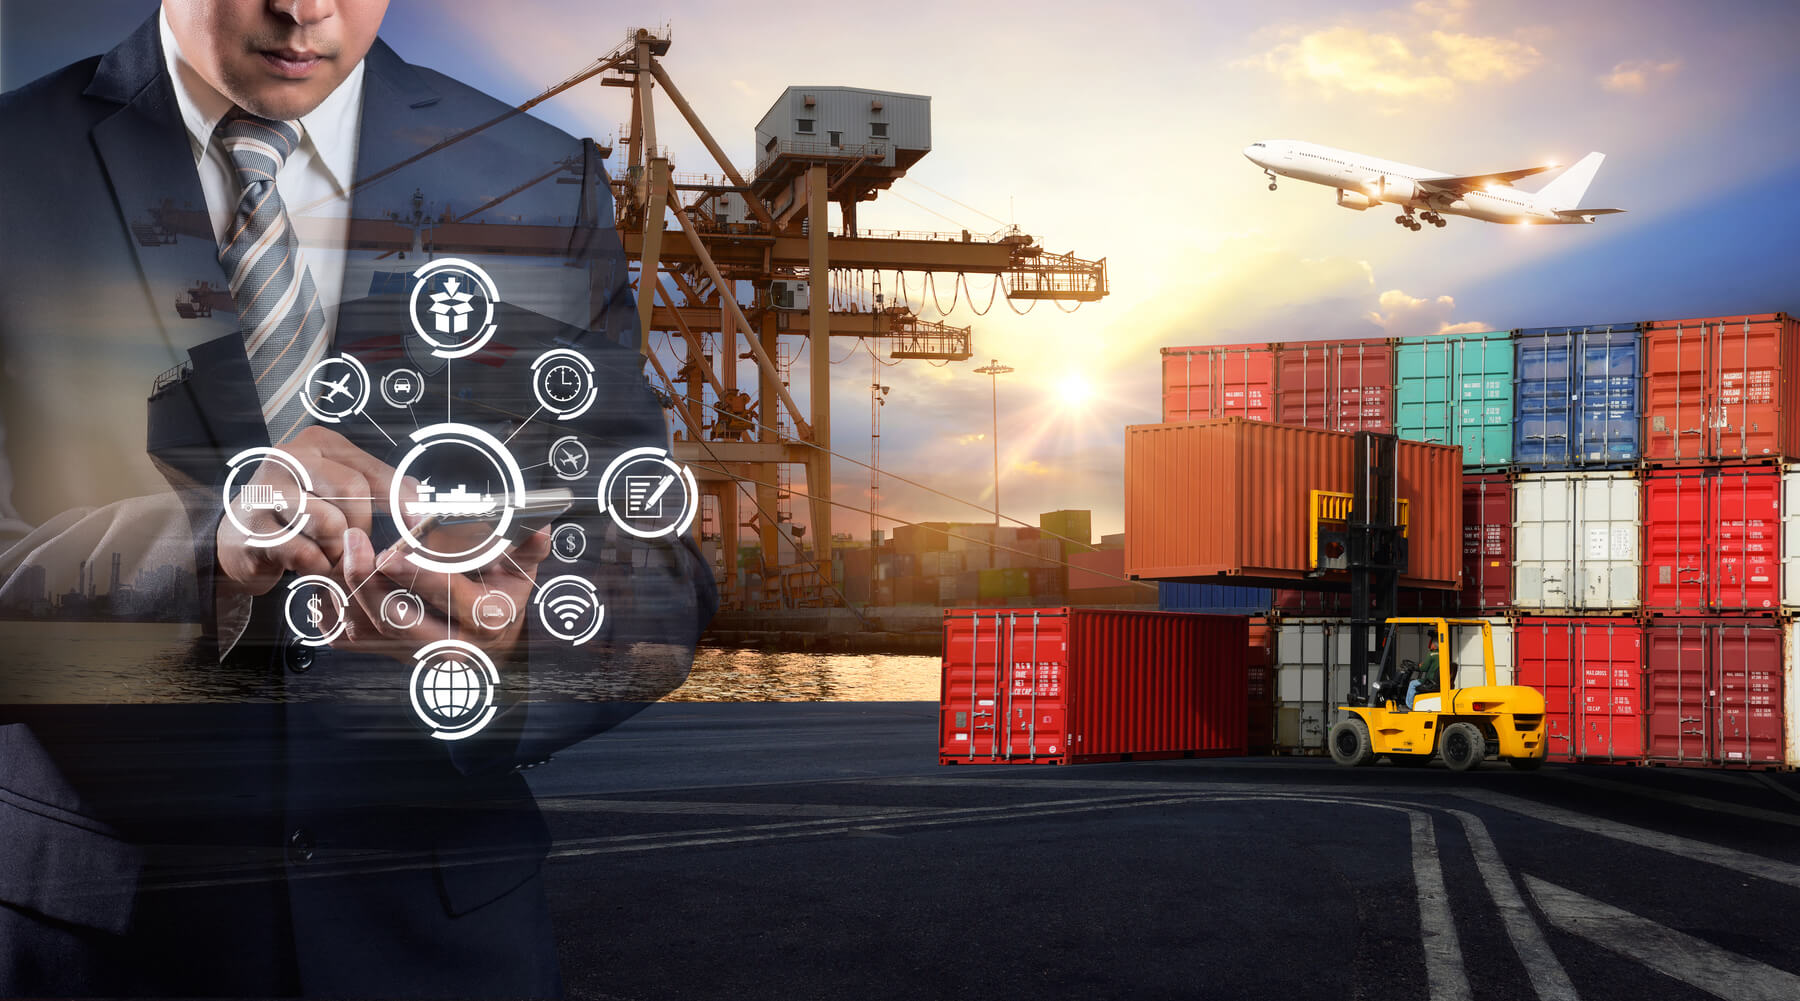 cellphone logistics at port